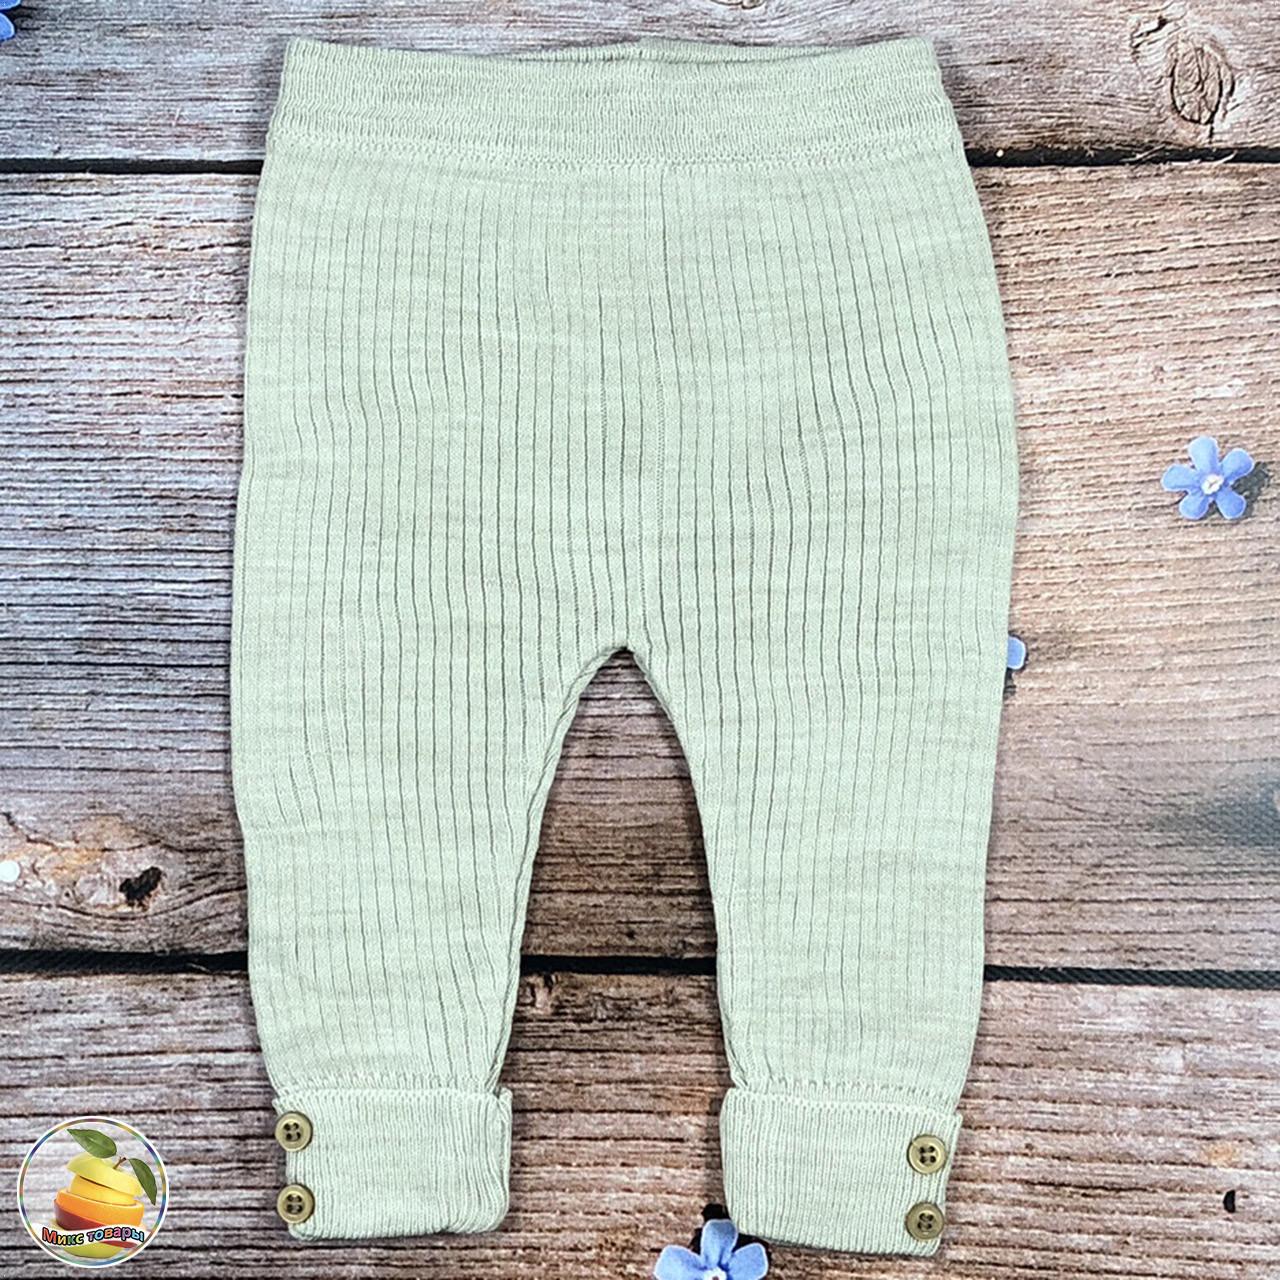 Серые вязанные лосины для малыша Размеры: 3-6,6-9,9-12,12-18 месяцев (8796-4)